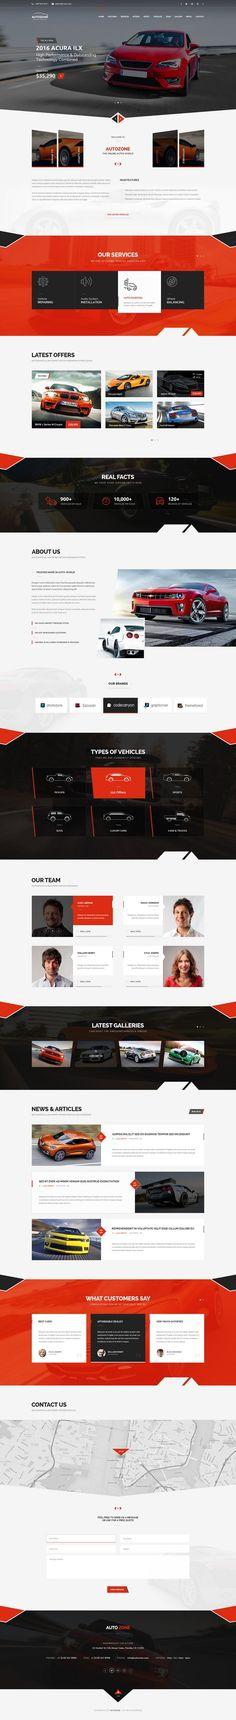 Automotive Website Design   Inspiration #12